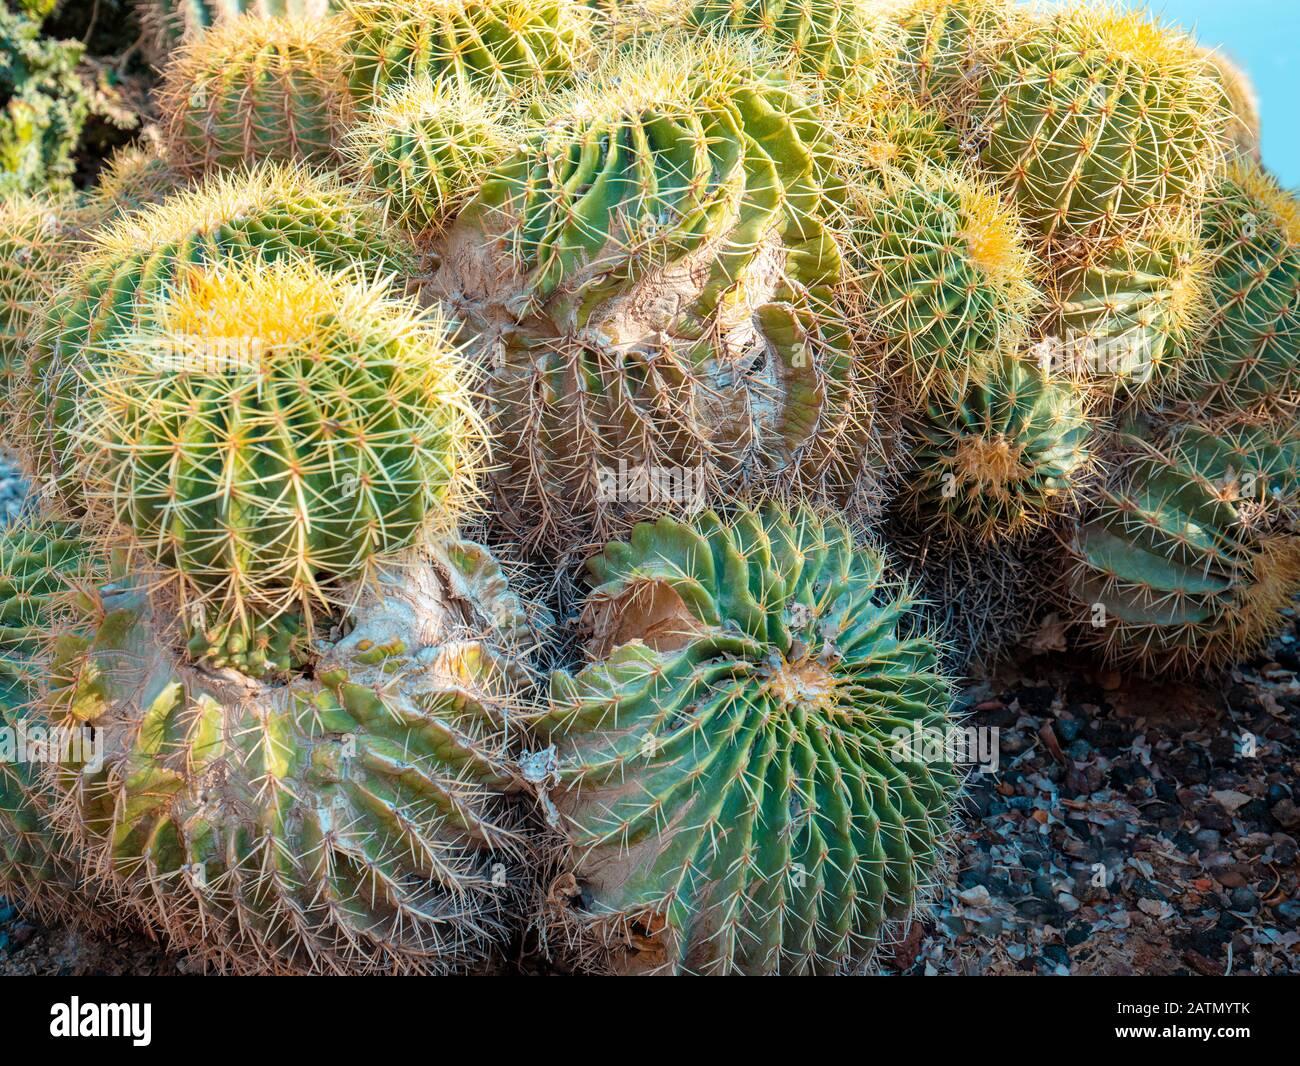 Cactus Bush Stock Photos Cactus Bush Stock Images Page 2 Alamy